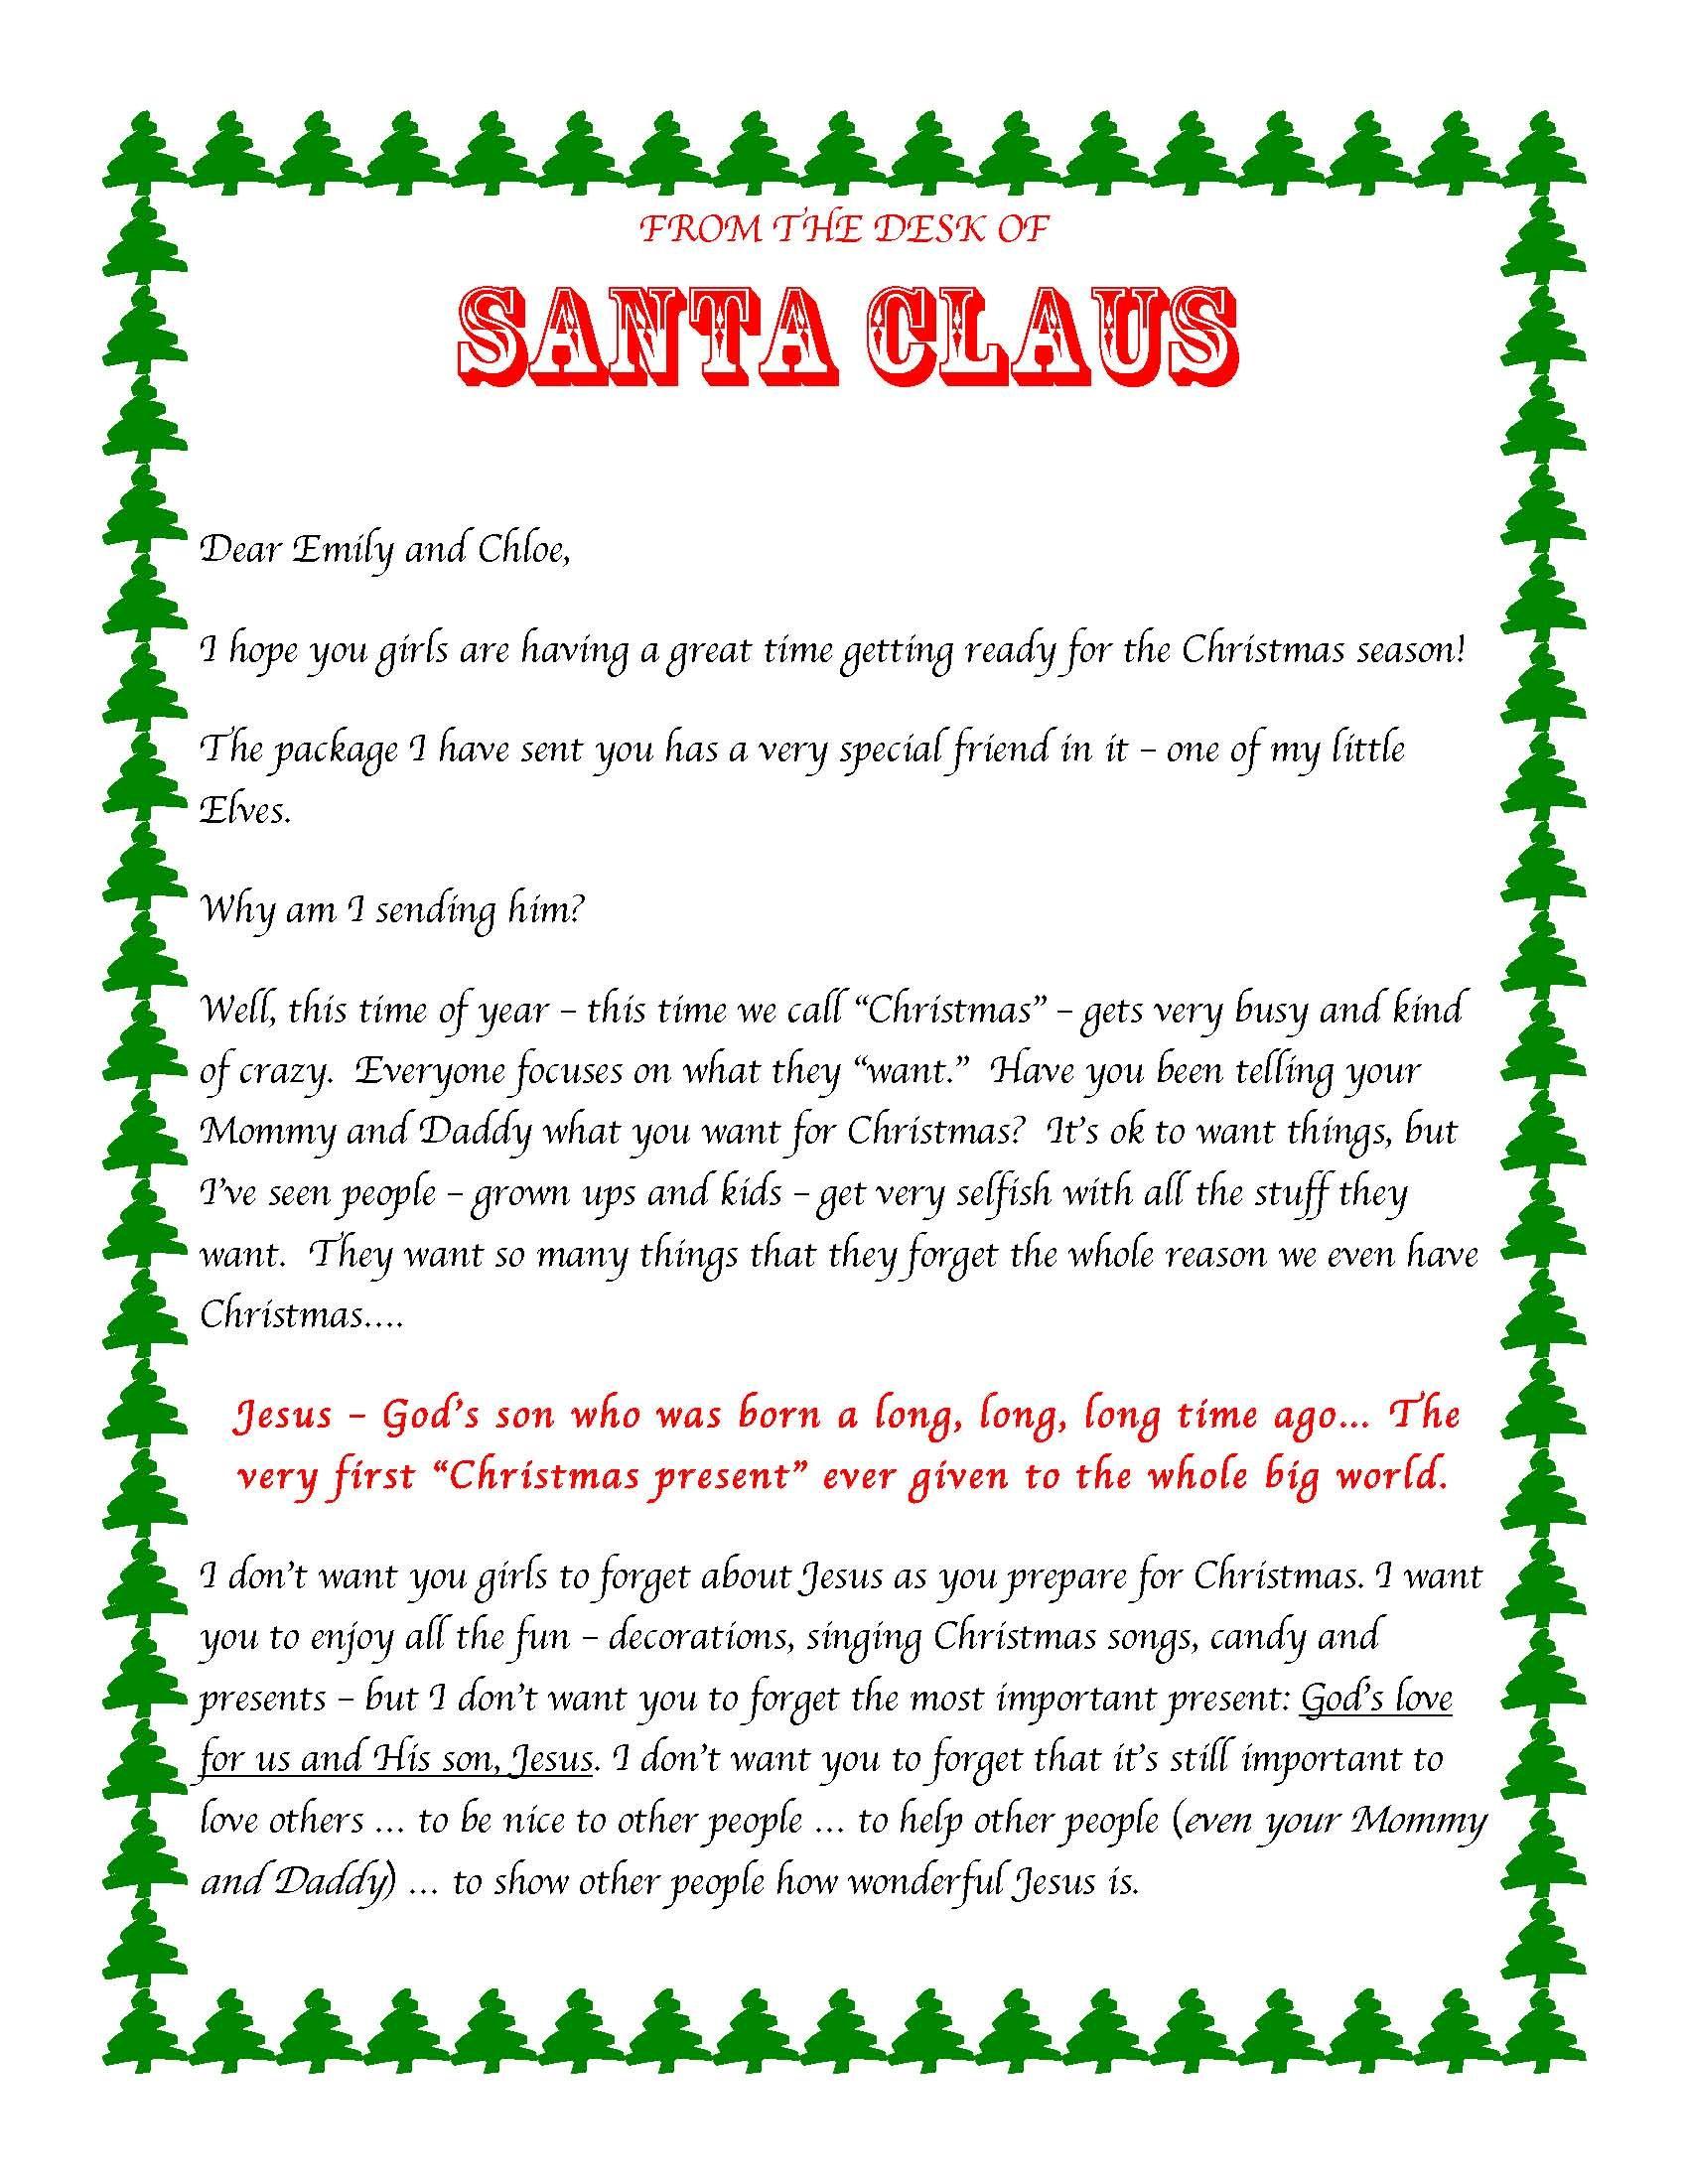 Elf on the Shelf intro letter including Jesus explanation